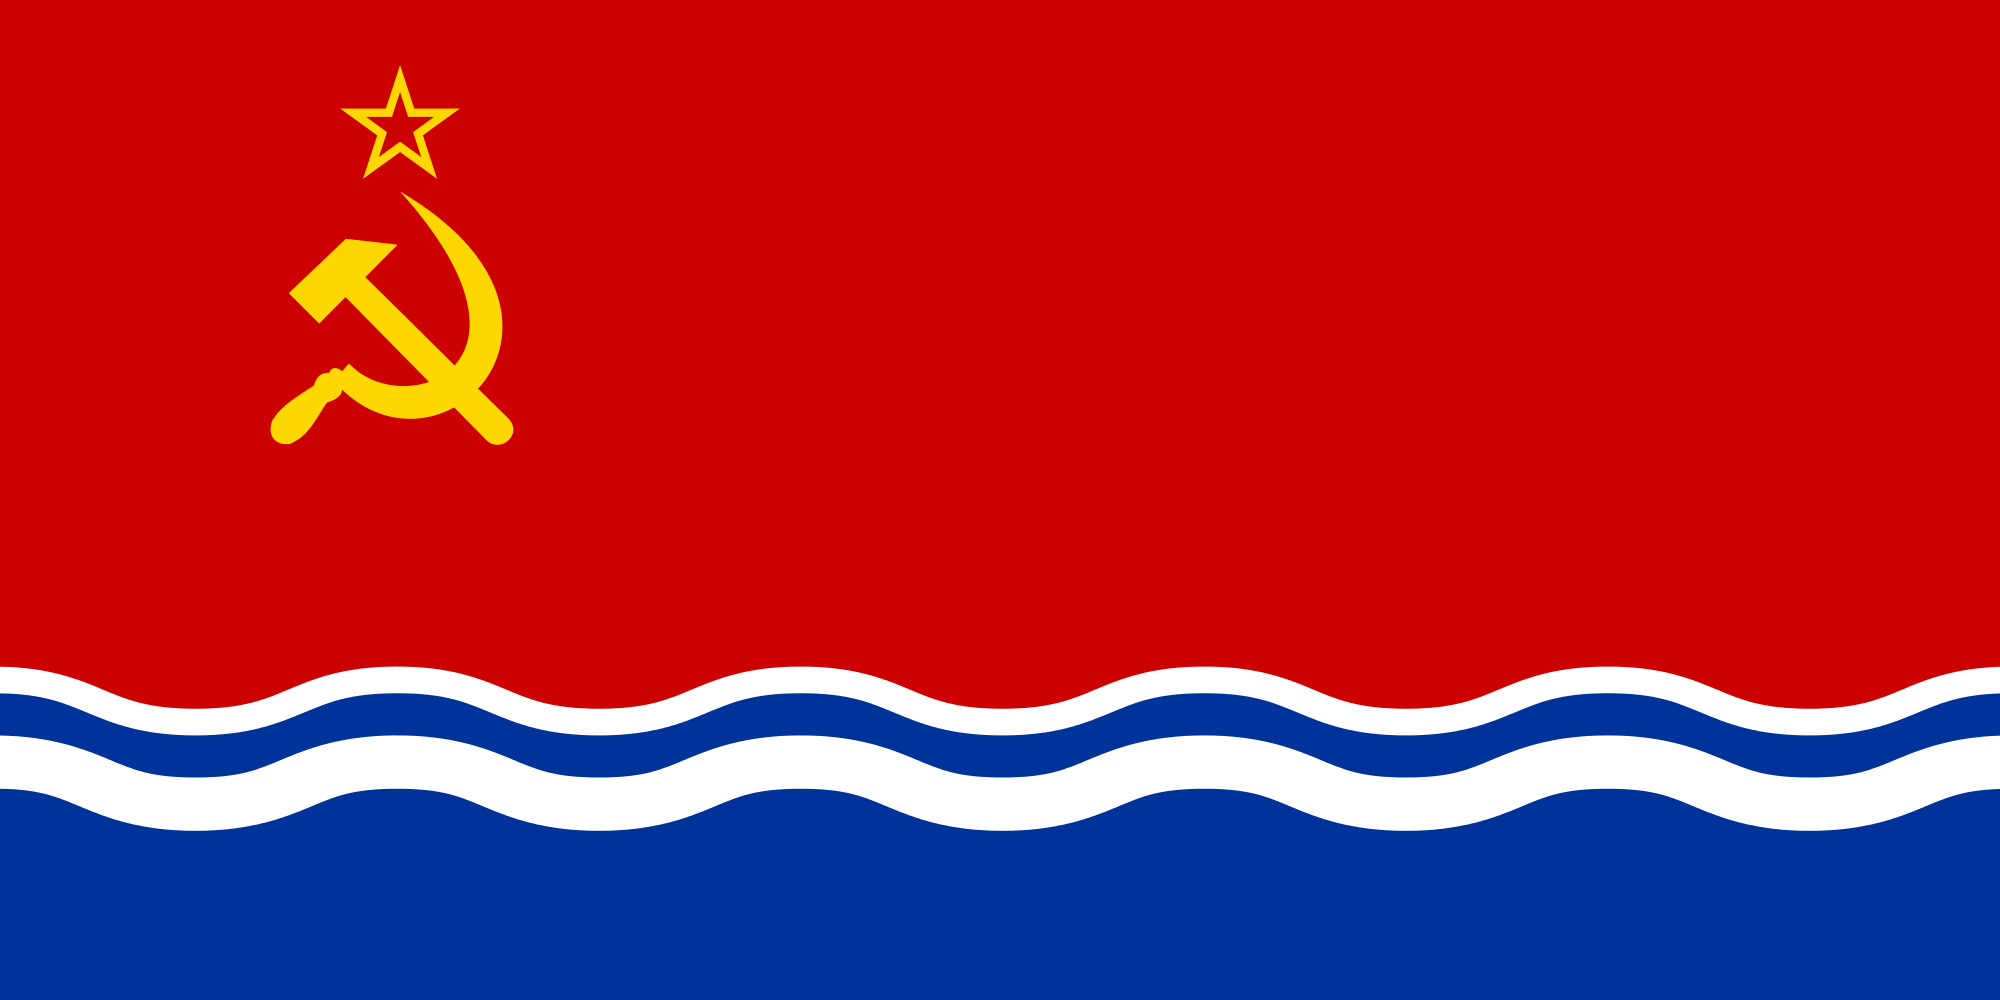 High Resolution Wallpaper | Flag Of Latvia 2000x1000 px